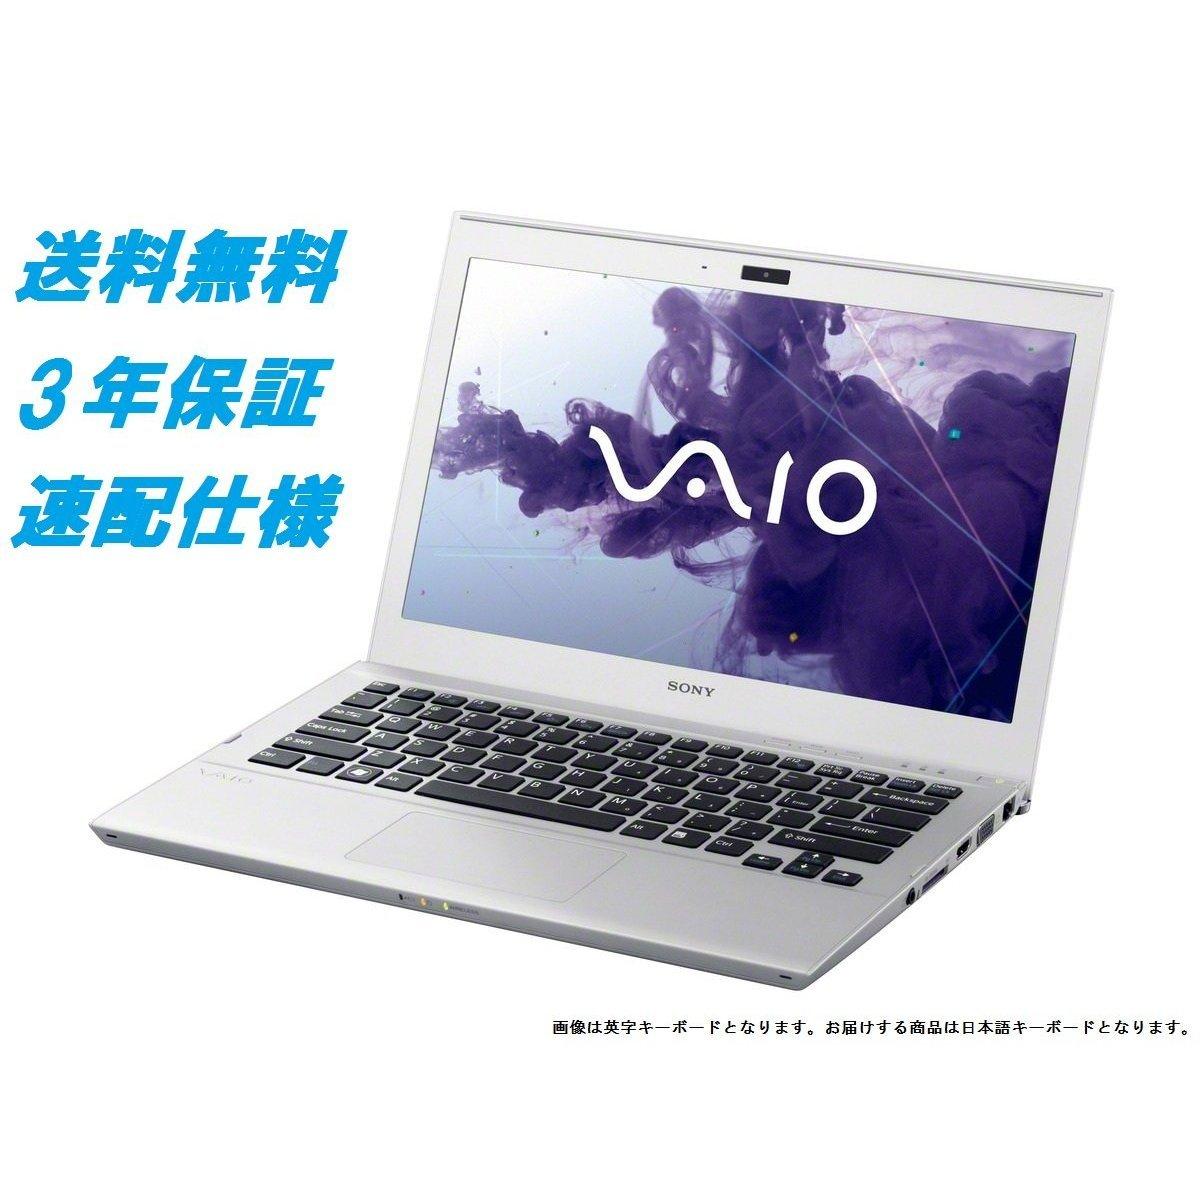 SONY VAIO ノートパソコン Tシリーズ13 13.3型ワイド液晶 シルバー intel Core i5(1.60GHz) メモリー4GB HybridHDD約320GB ドライブ非搭載 802.11bgn Windows7 HomePremium Officeなし 3年保証   B00DM09GEQ